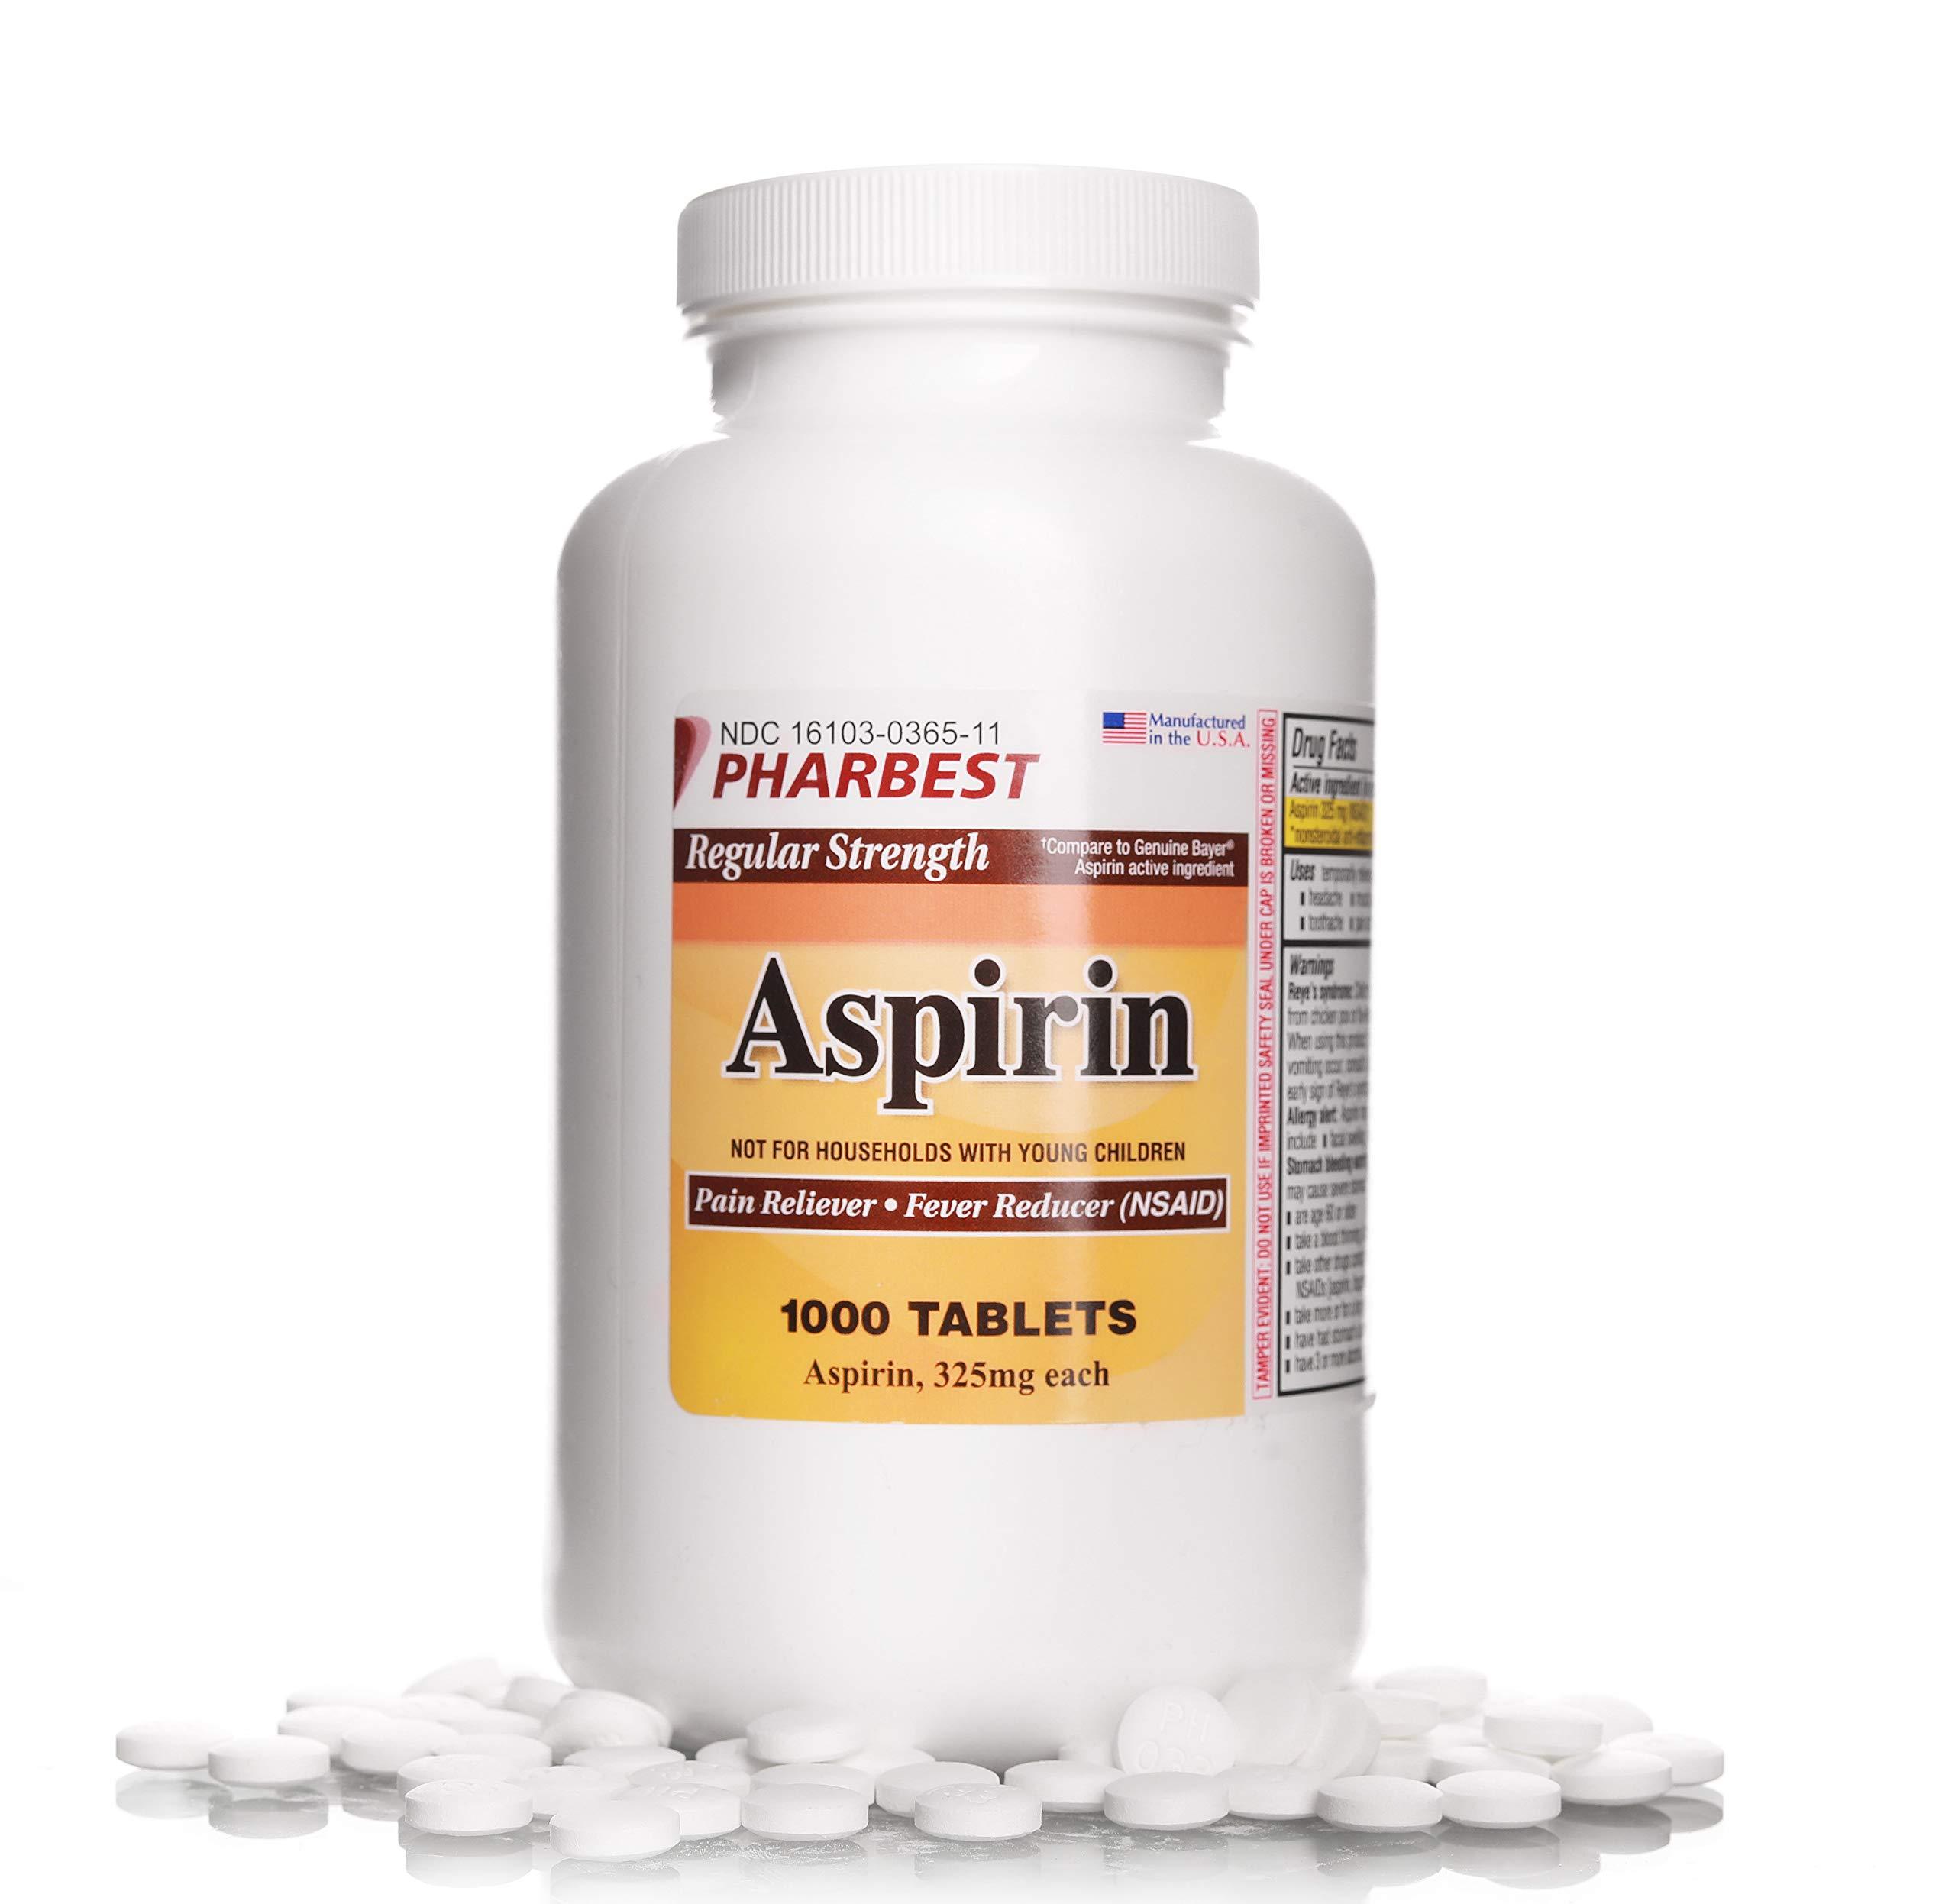 Aspirin 325 mg | Regular Strength | 1000 Count Uncoated Tablets